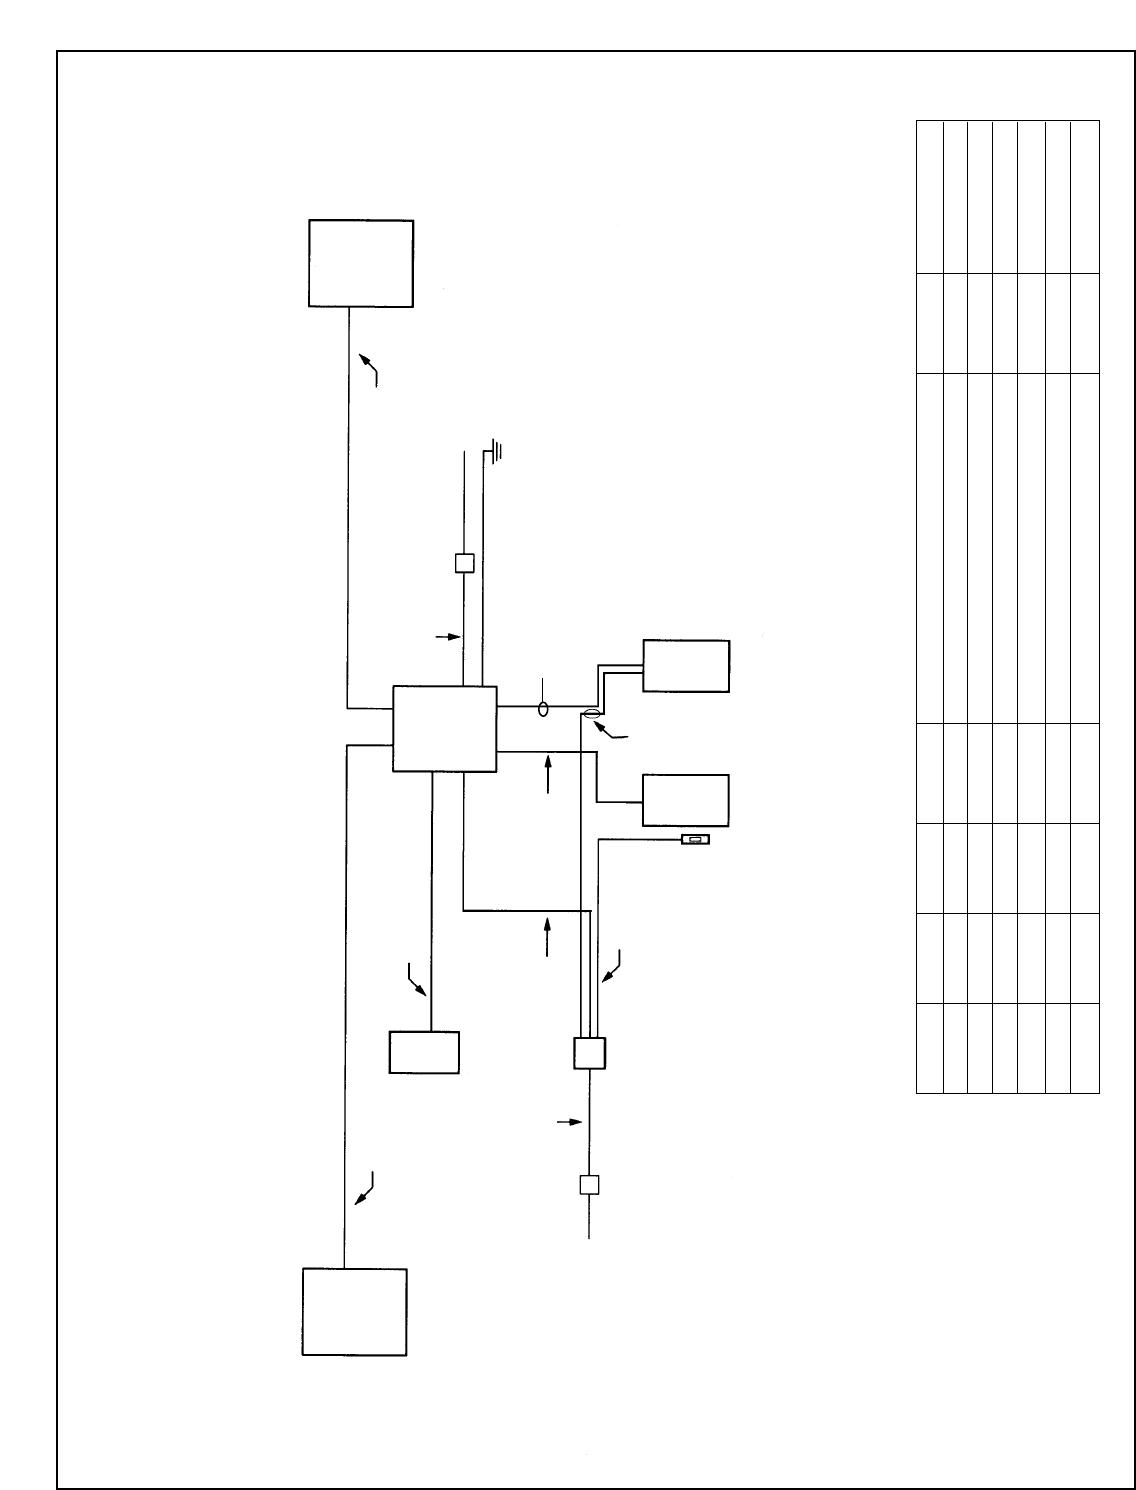 NuTone IK-15, IK-25, IM-3204WH, IM-3303, IM-4406, IM-5000, IMA-516 on